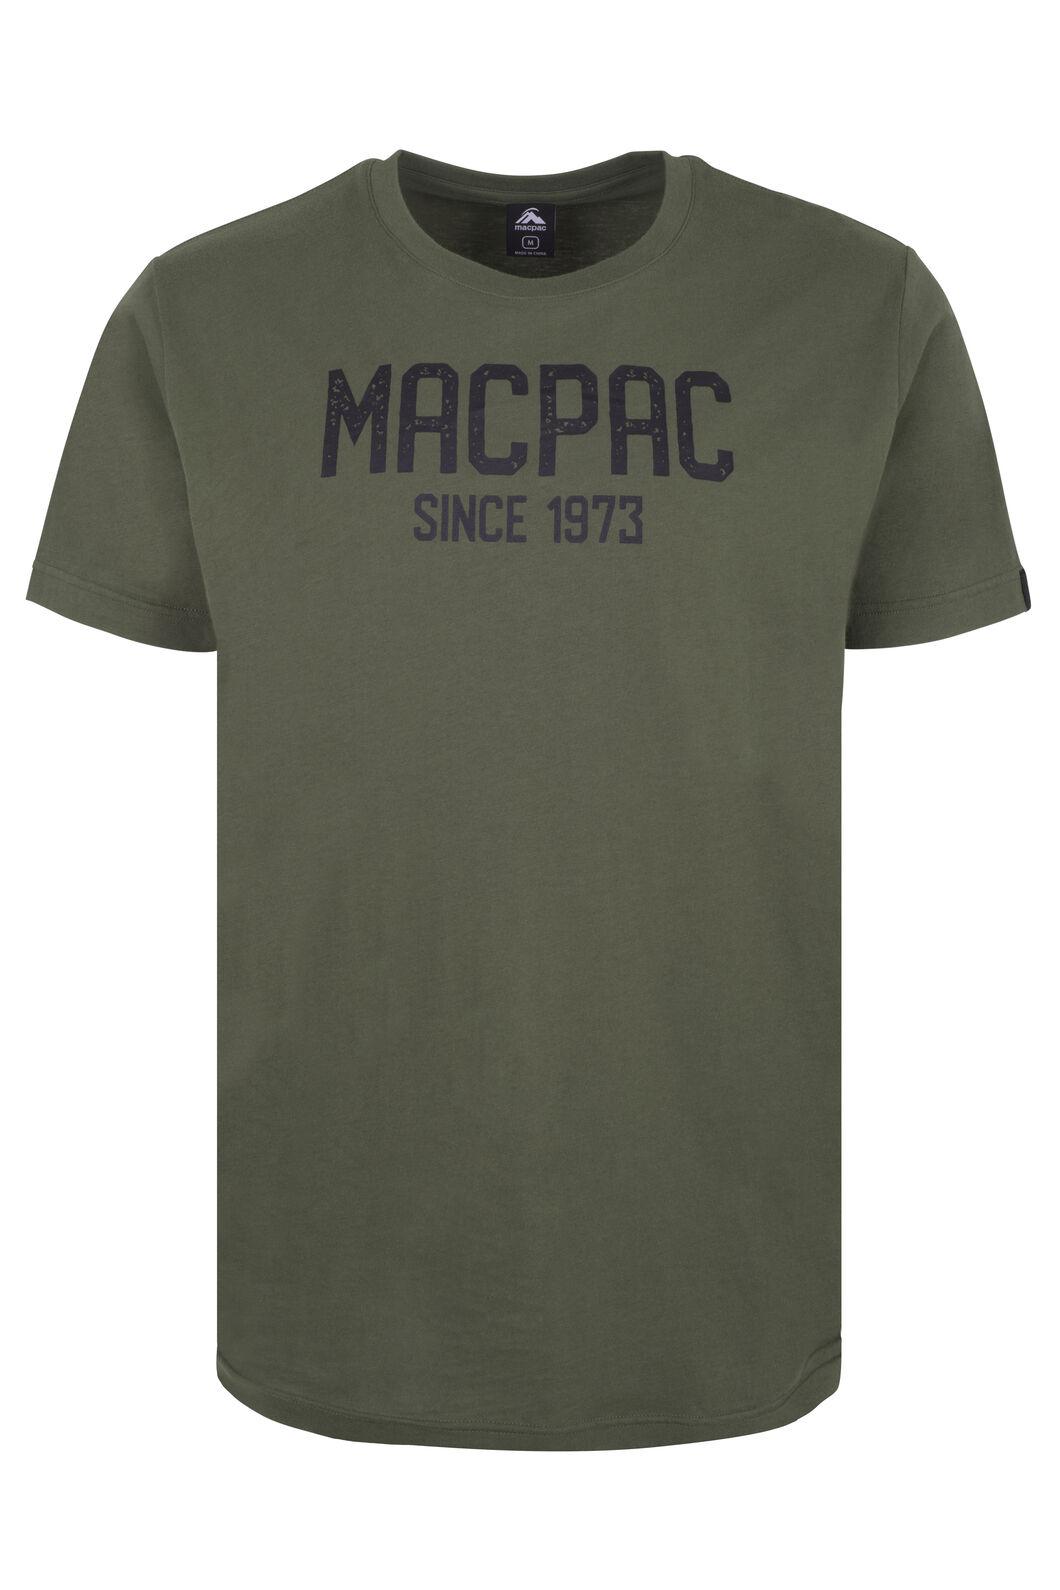 Macpac Freshman Organic Cotton Tee - Men's, Grape Leaf, hi-res